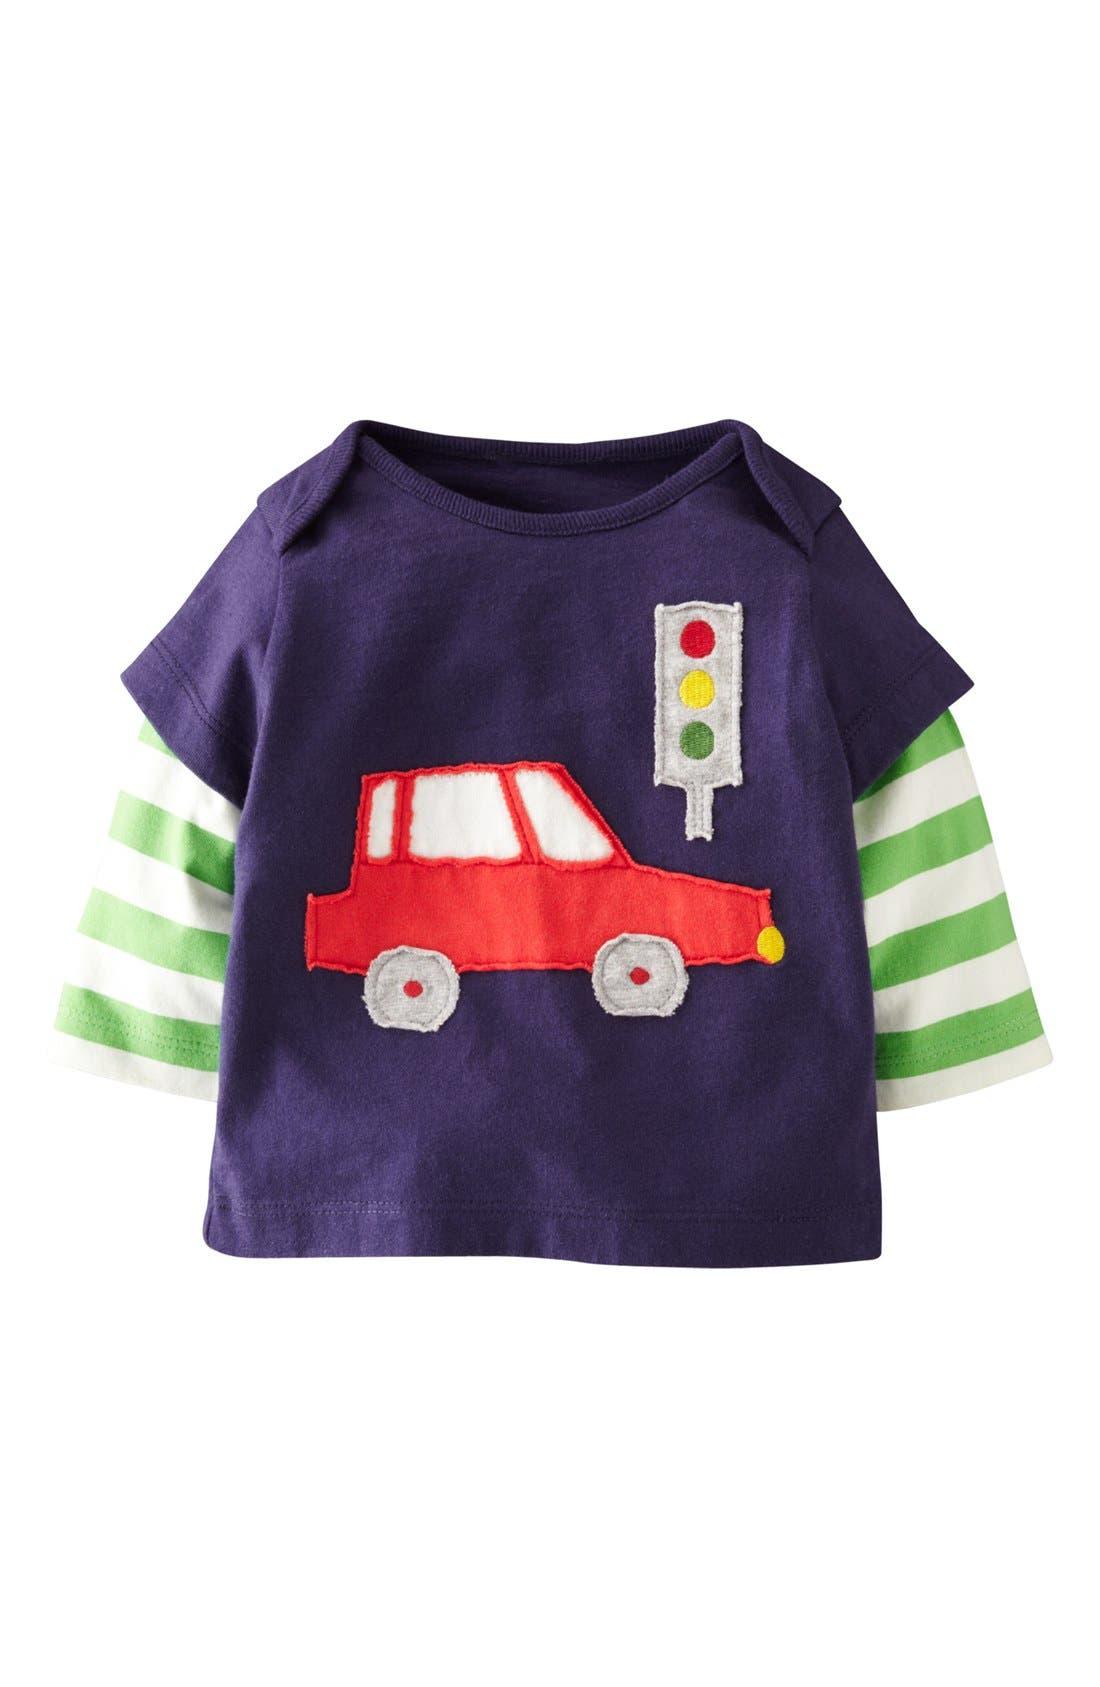 Alternate Image 1 Selected - Mini Boden 'London' Appliqué Layered Sleeve T-Shirt (Baby Boys)